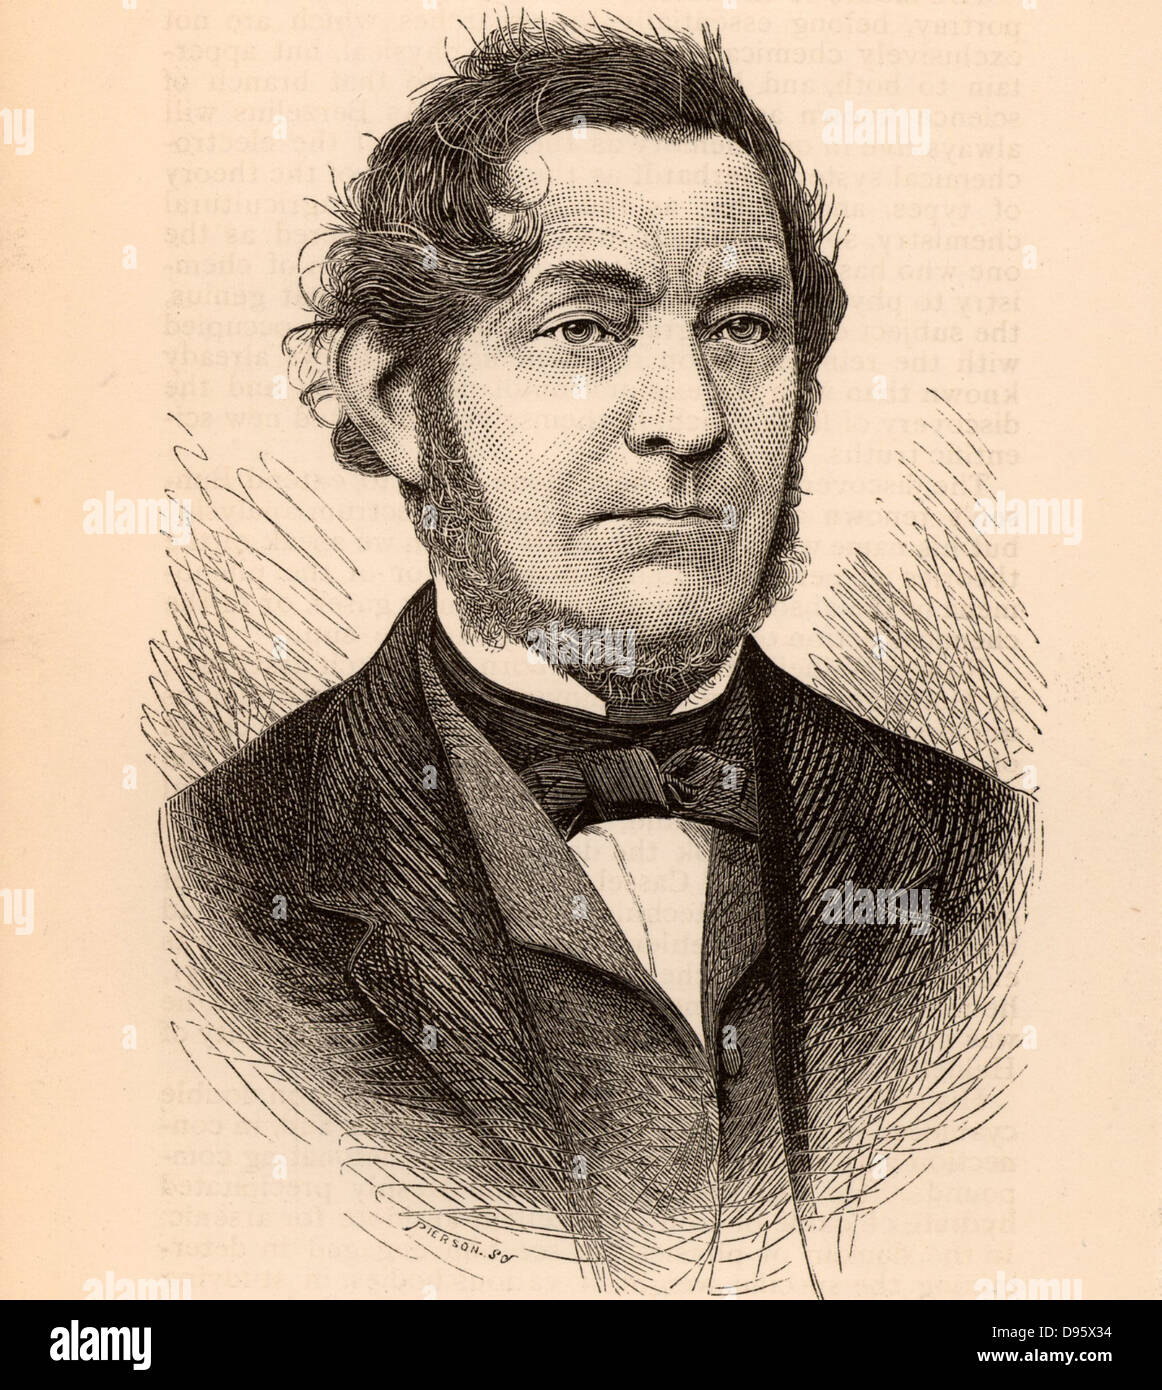 Robert Wilhelm Eberhard von Bunsen (1811-1899) German chemist and spectroscopist.  The Bunsen burner, the gas burner - Stock Image